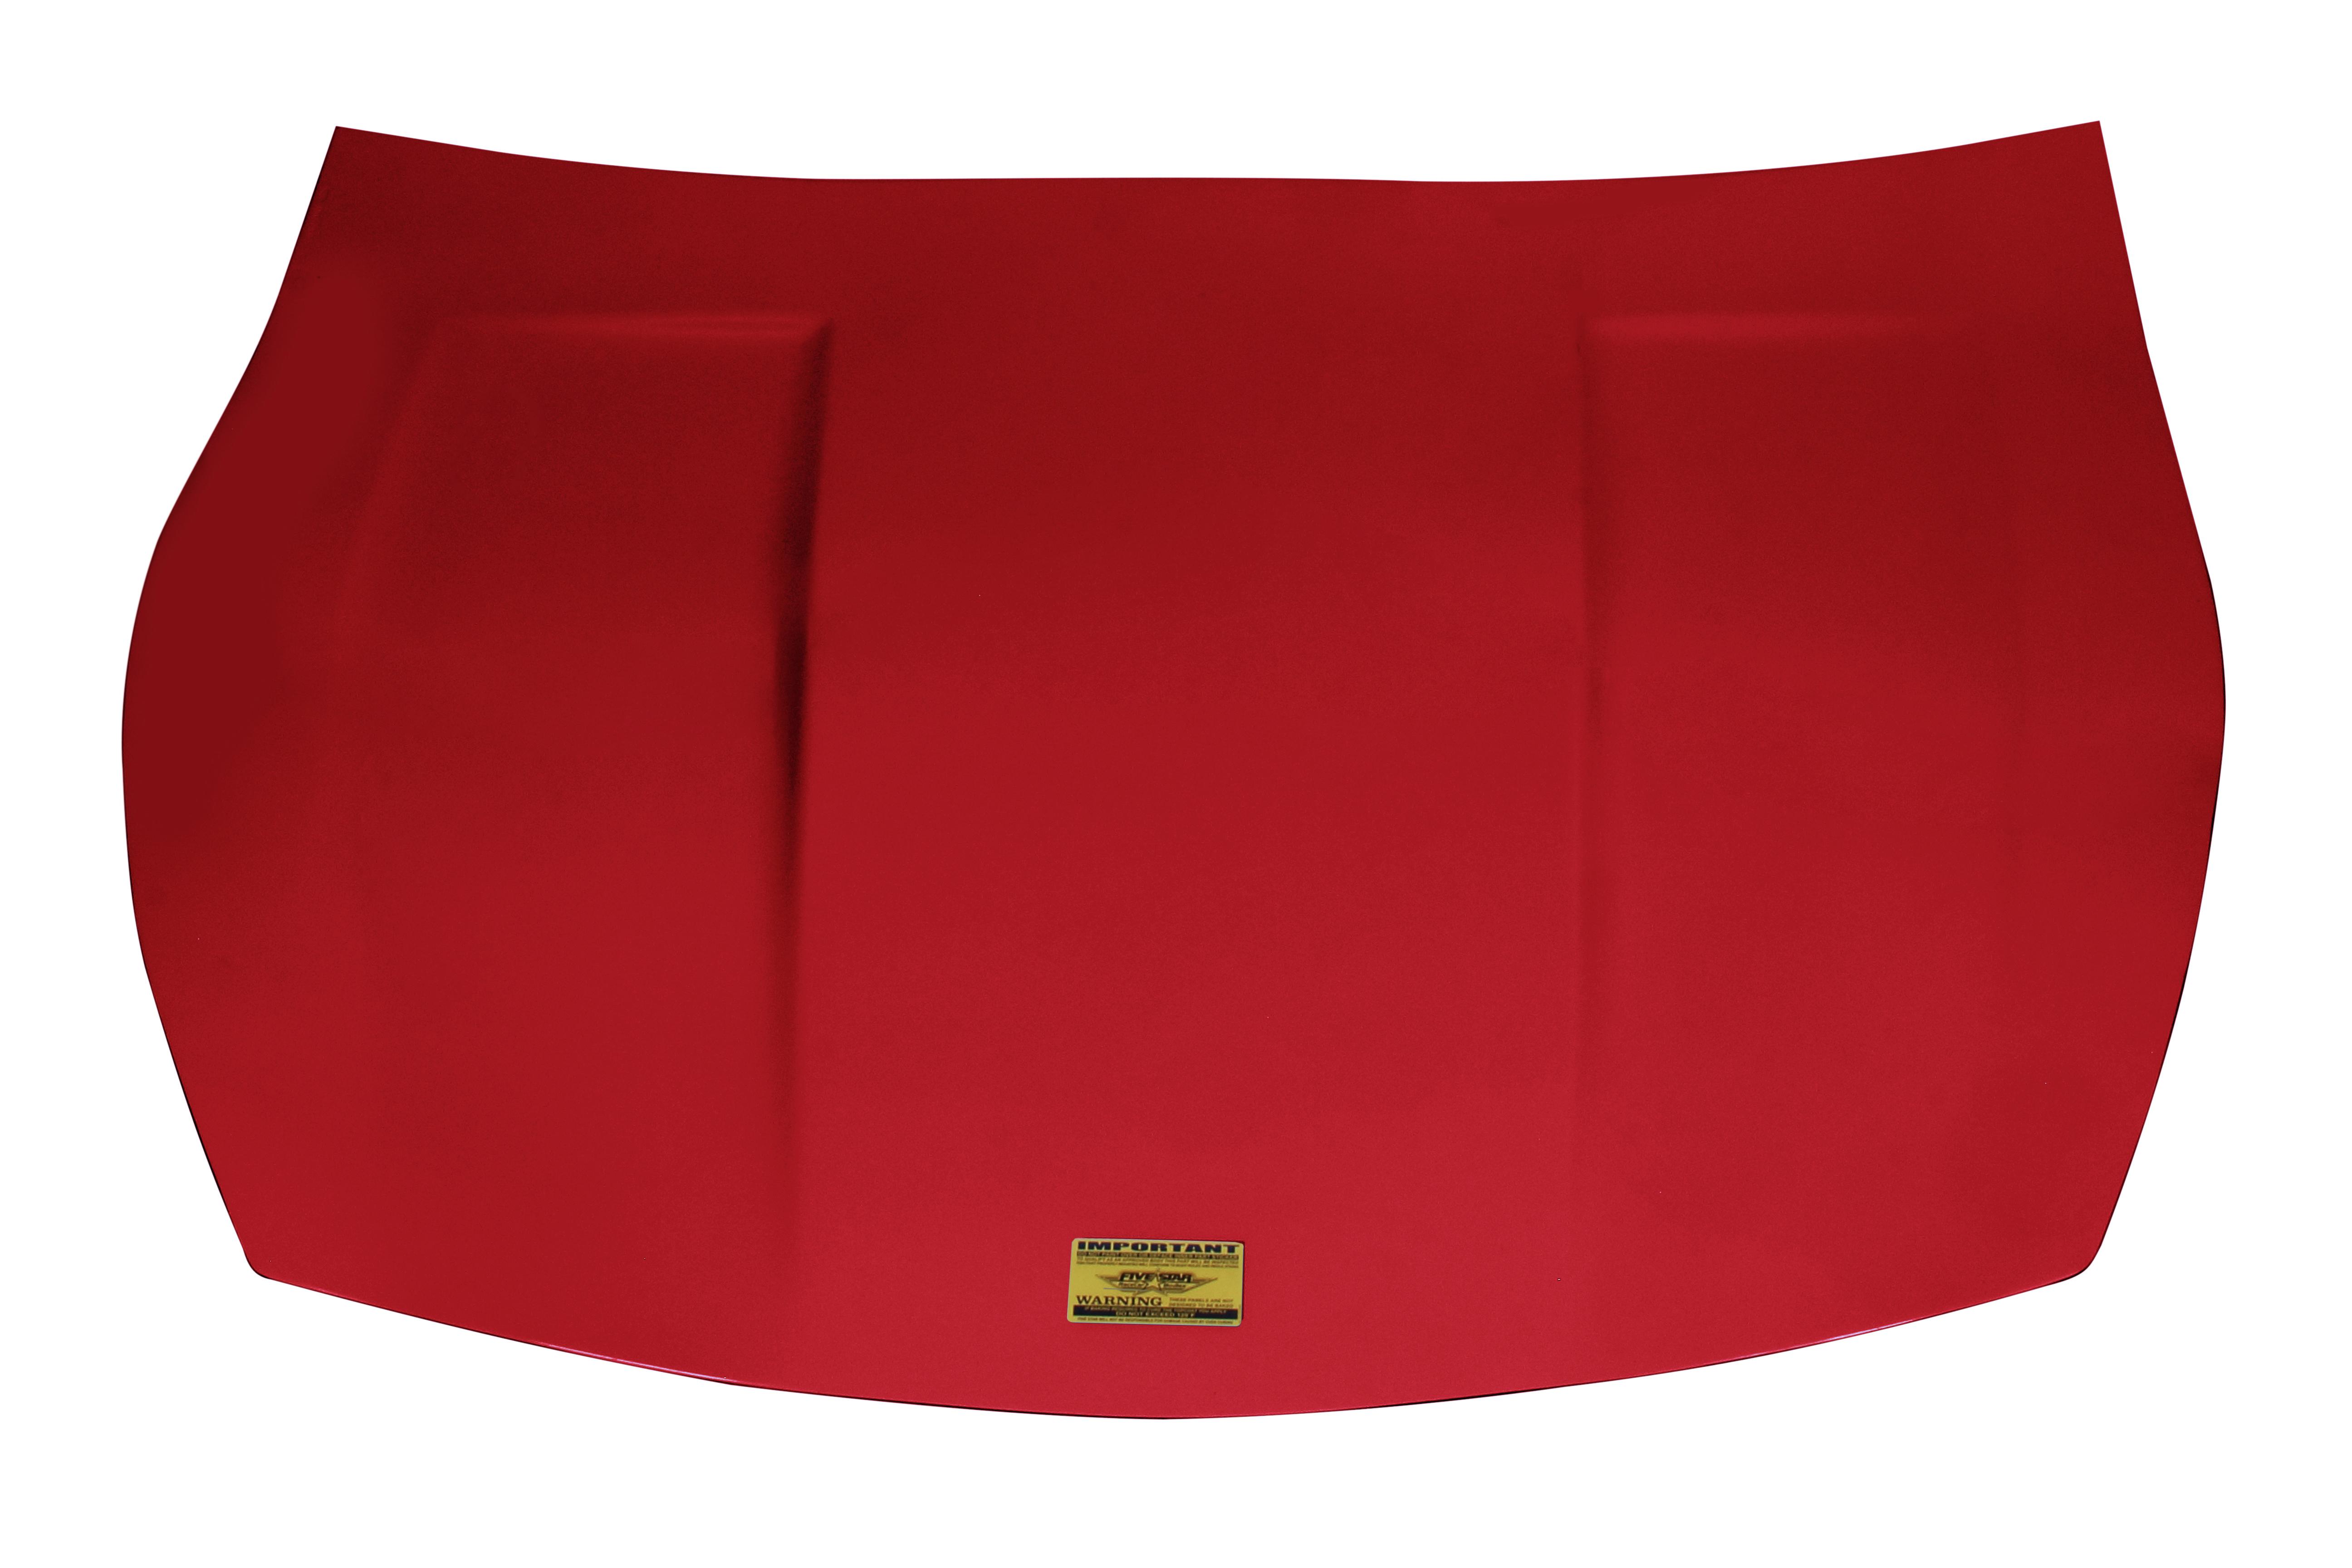 Fivestar 2019 LM Lightweight Composite Hood Red